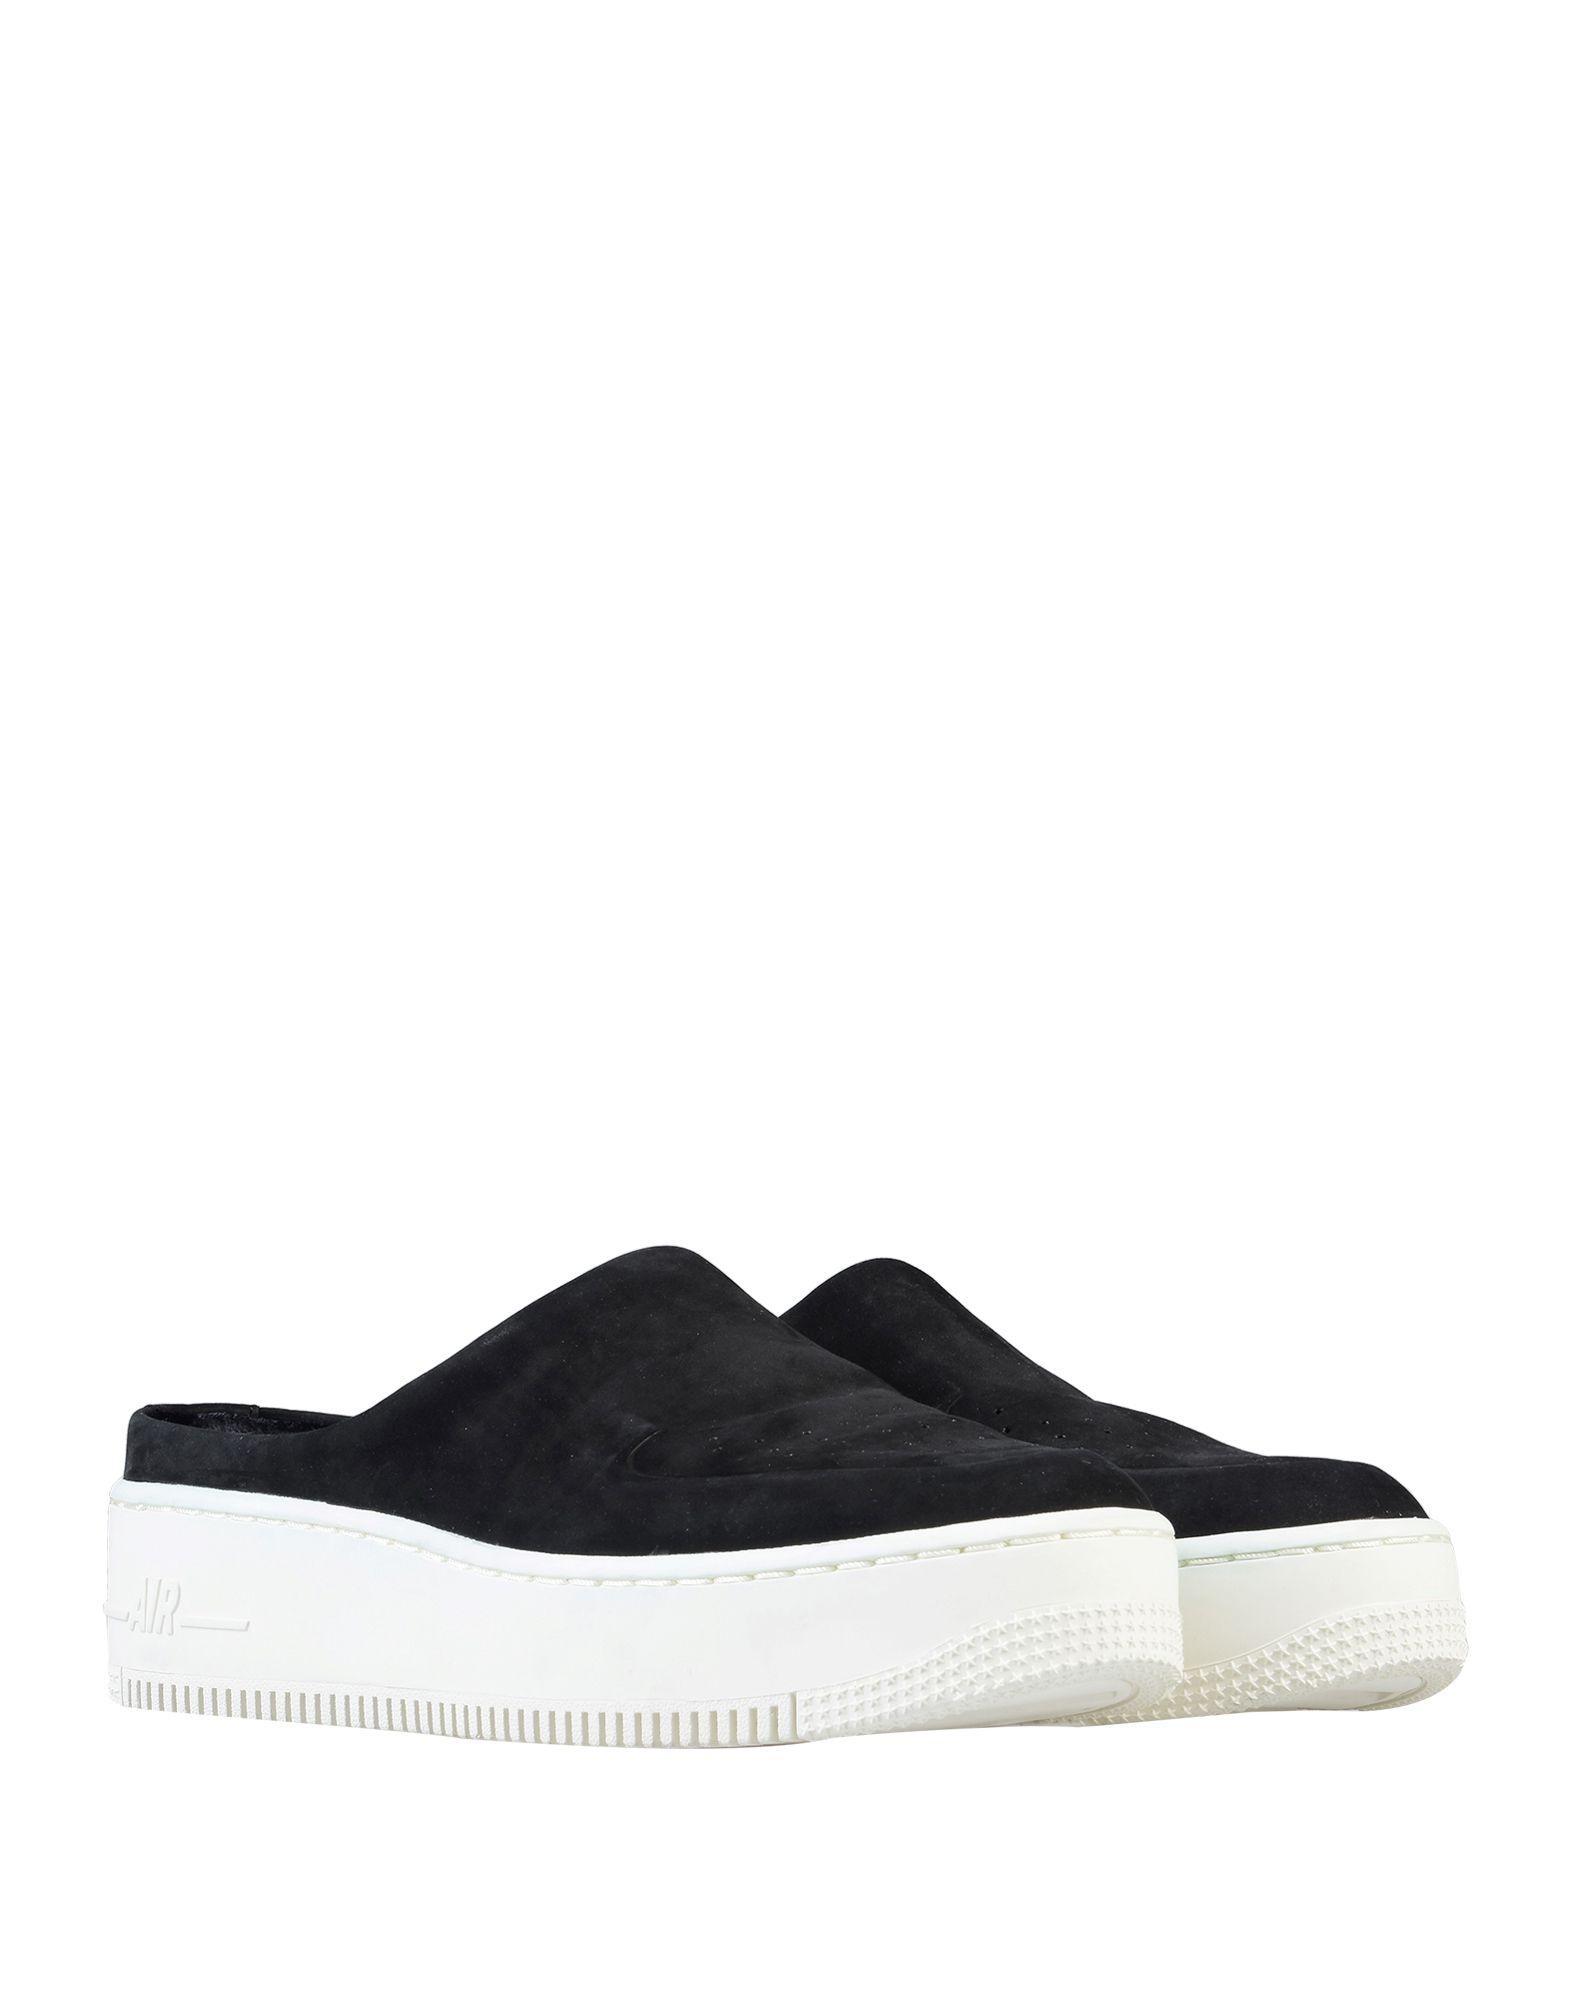 Mules AF1 Lover XX Premium Nike de Cuero de color Negro